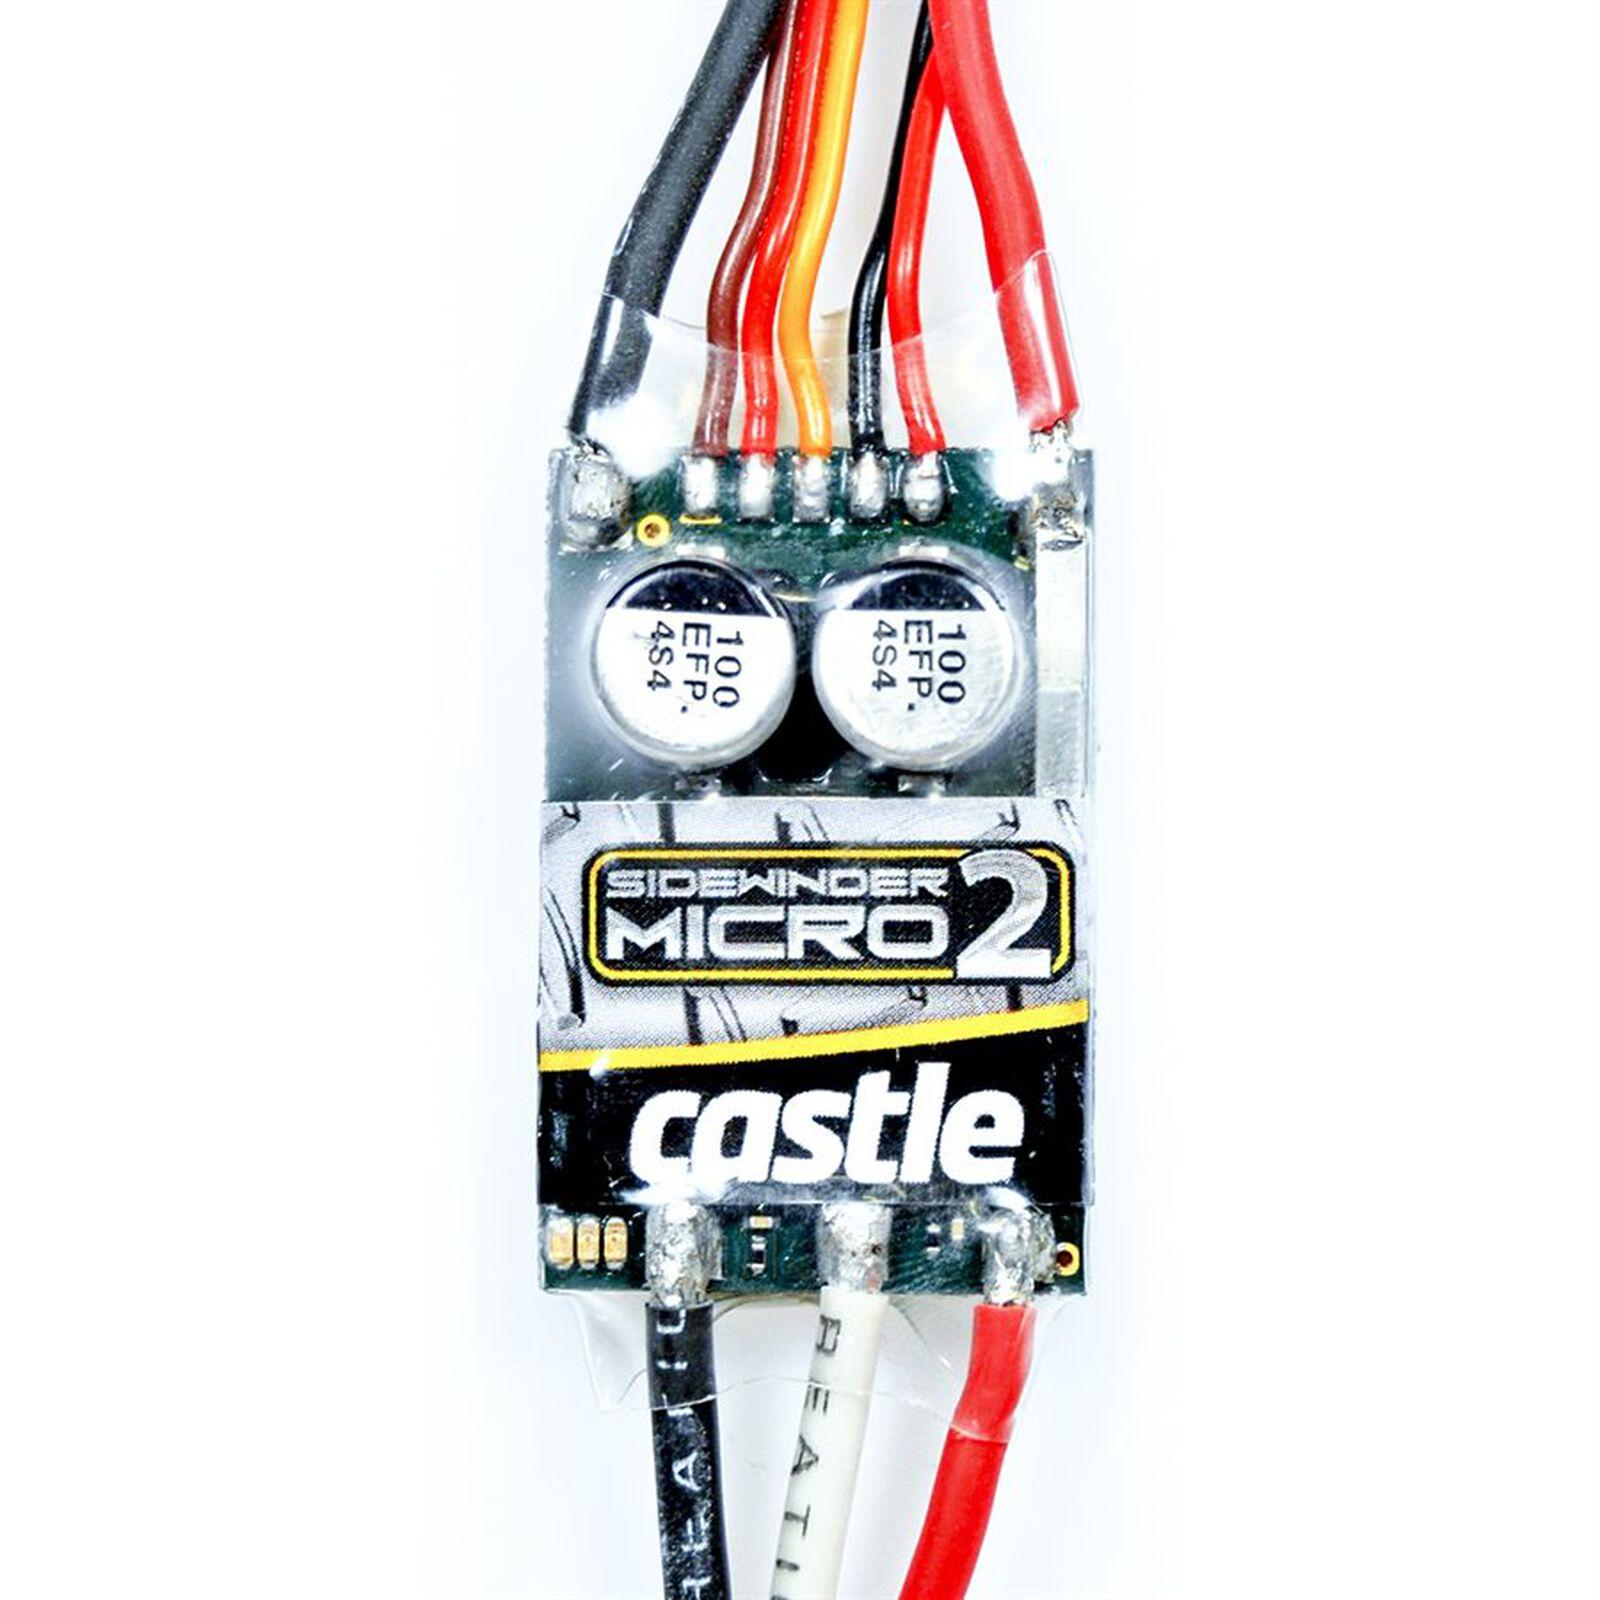 1/18 Sidewinder Micro 2 ESC, 12.6V, 2A Peak BEC